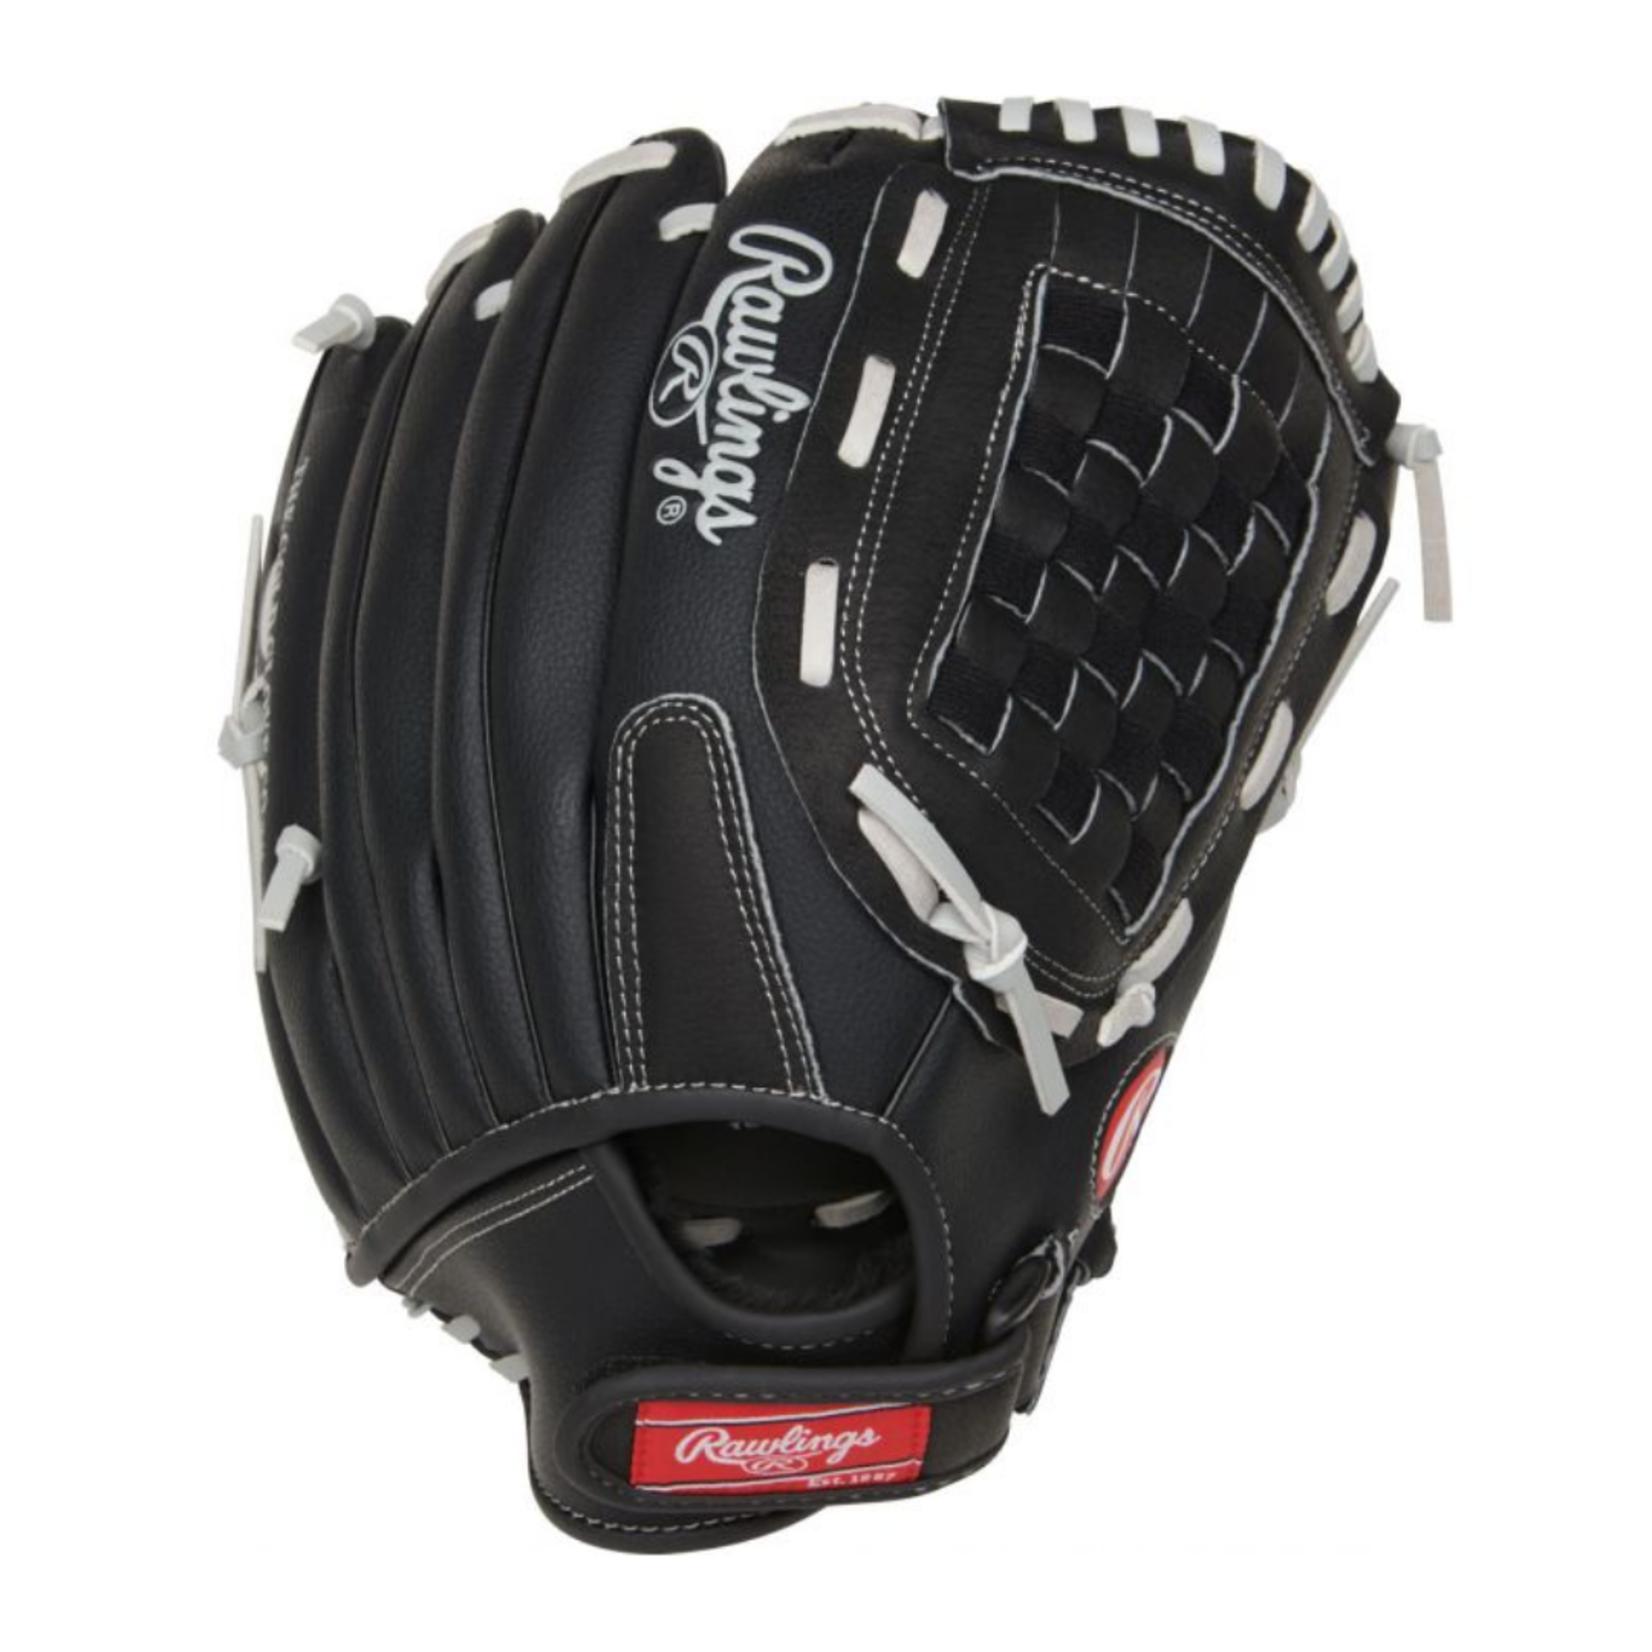 "Softball Series NEO FB/BSKT Softball Glove - 13"""